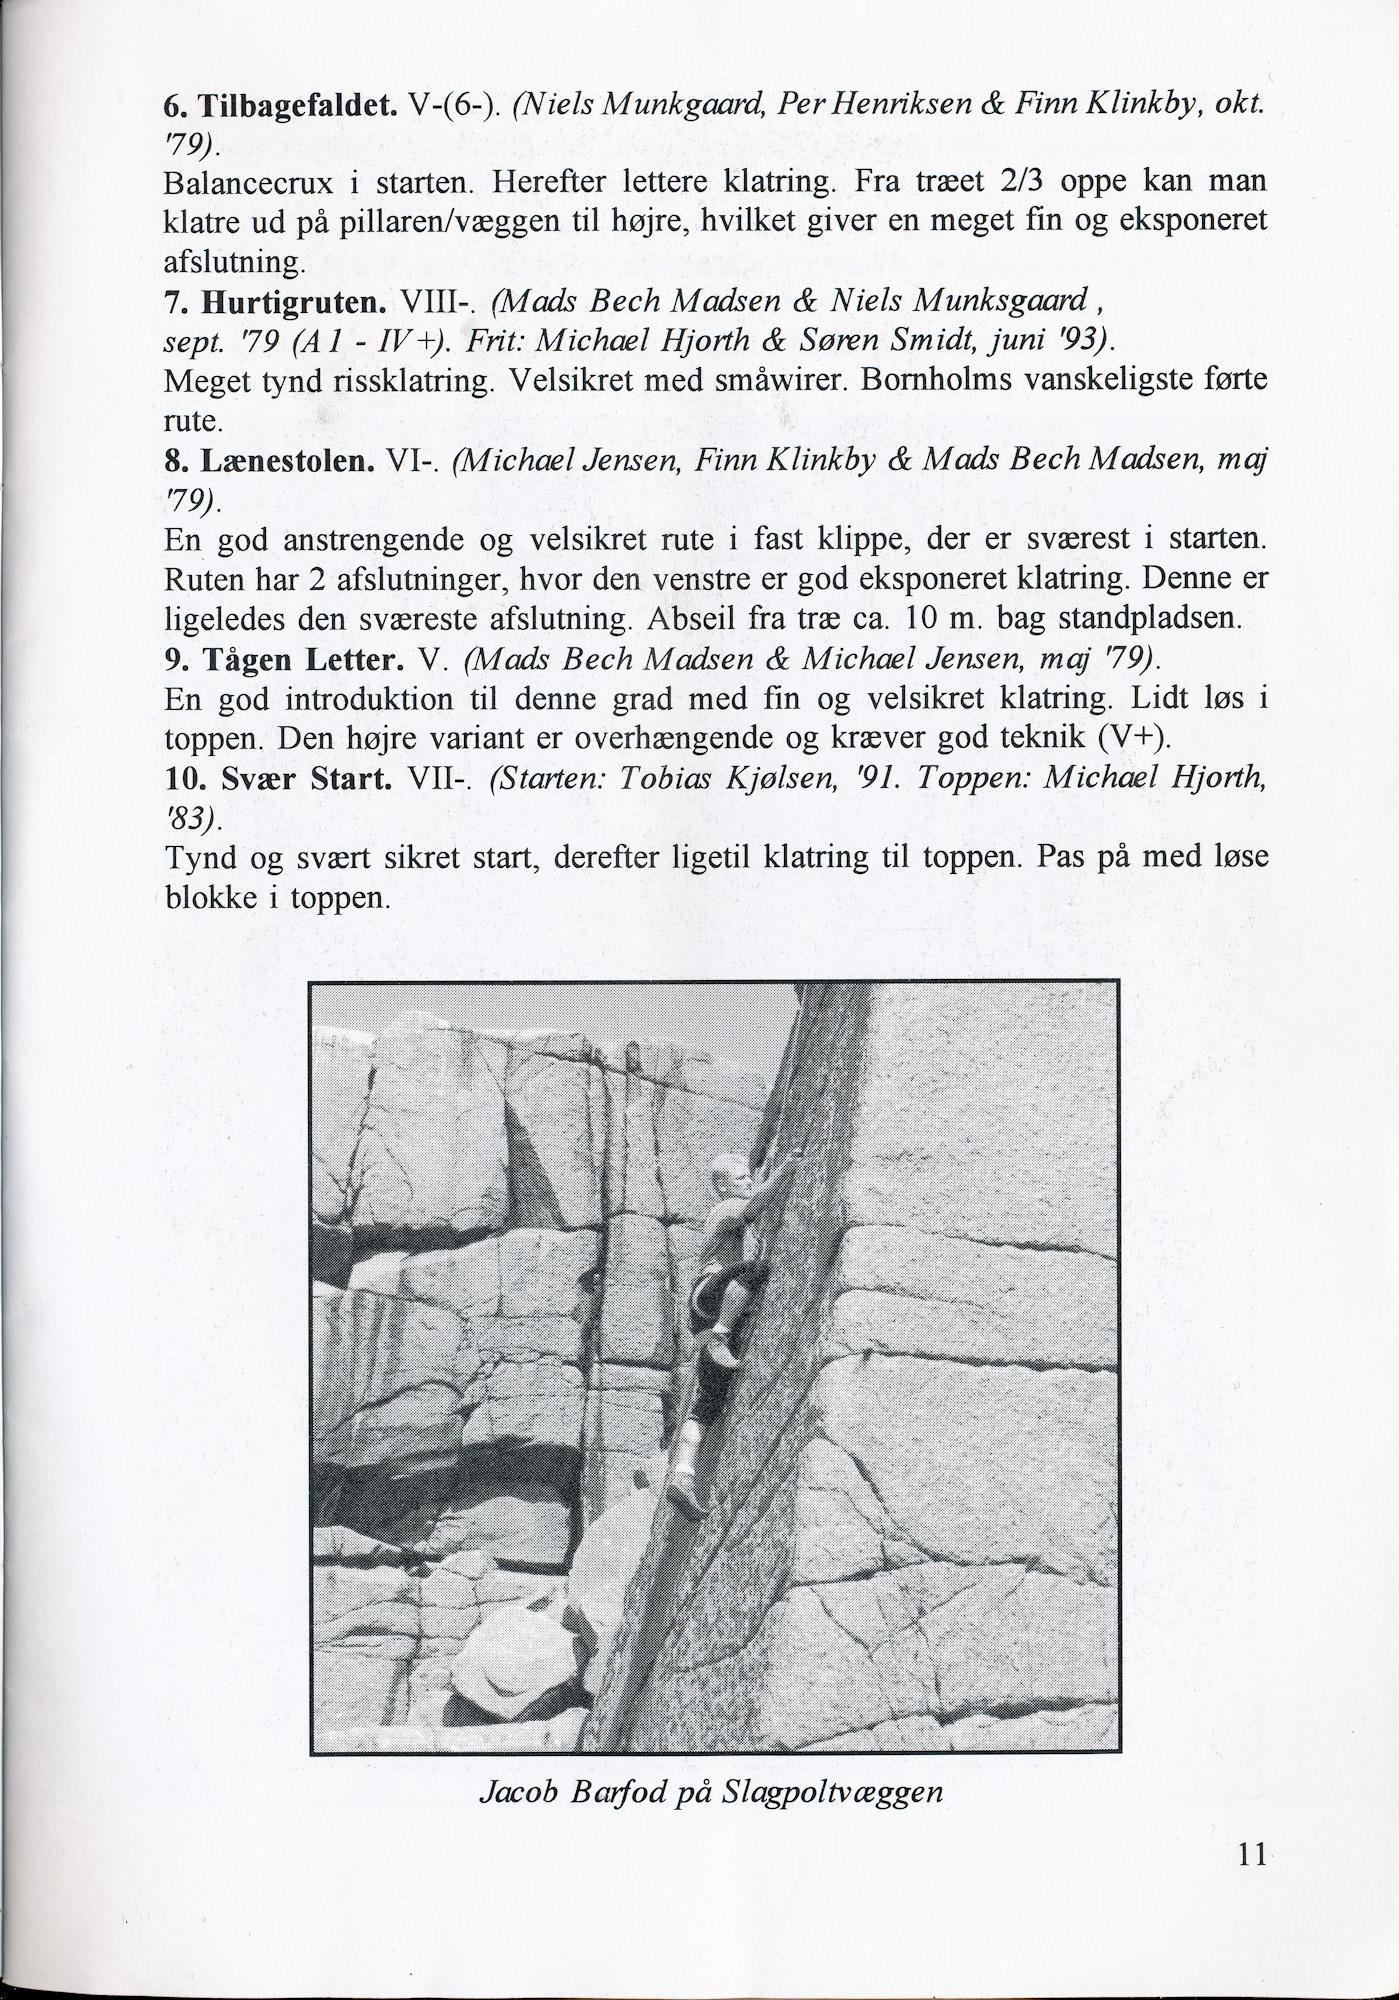 50 udvalgte ruter paa bornholm 1995 11.jpg